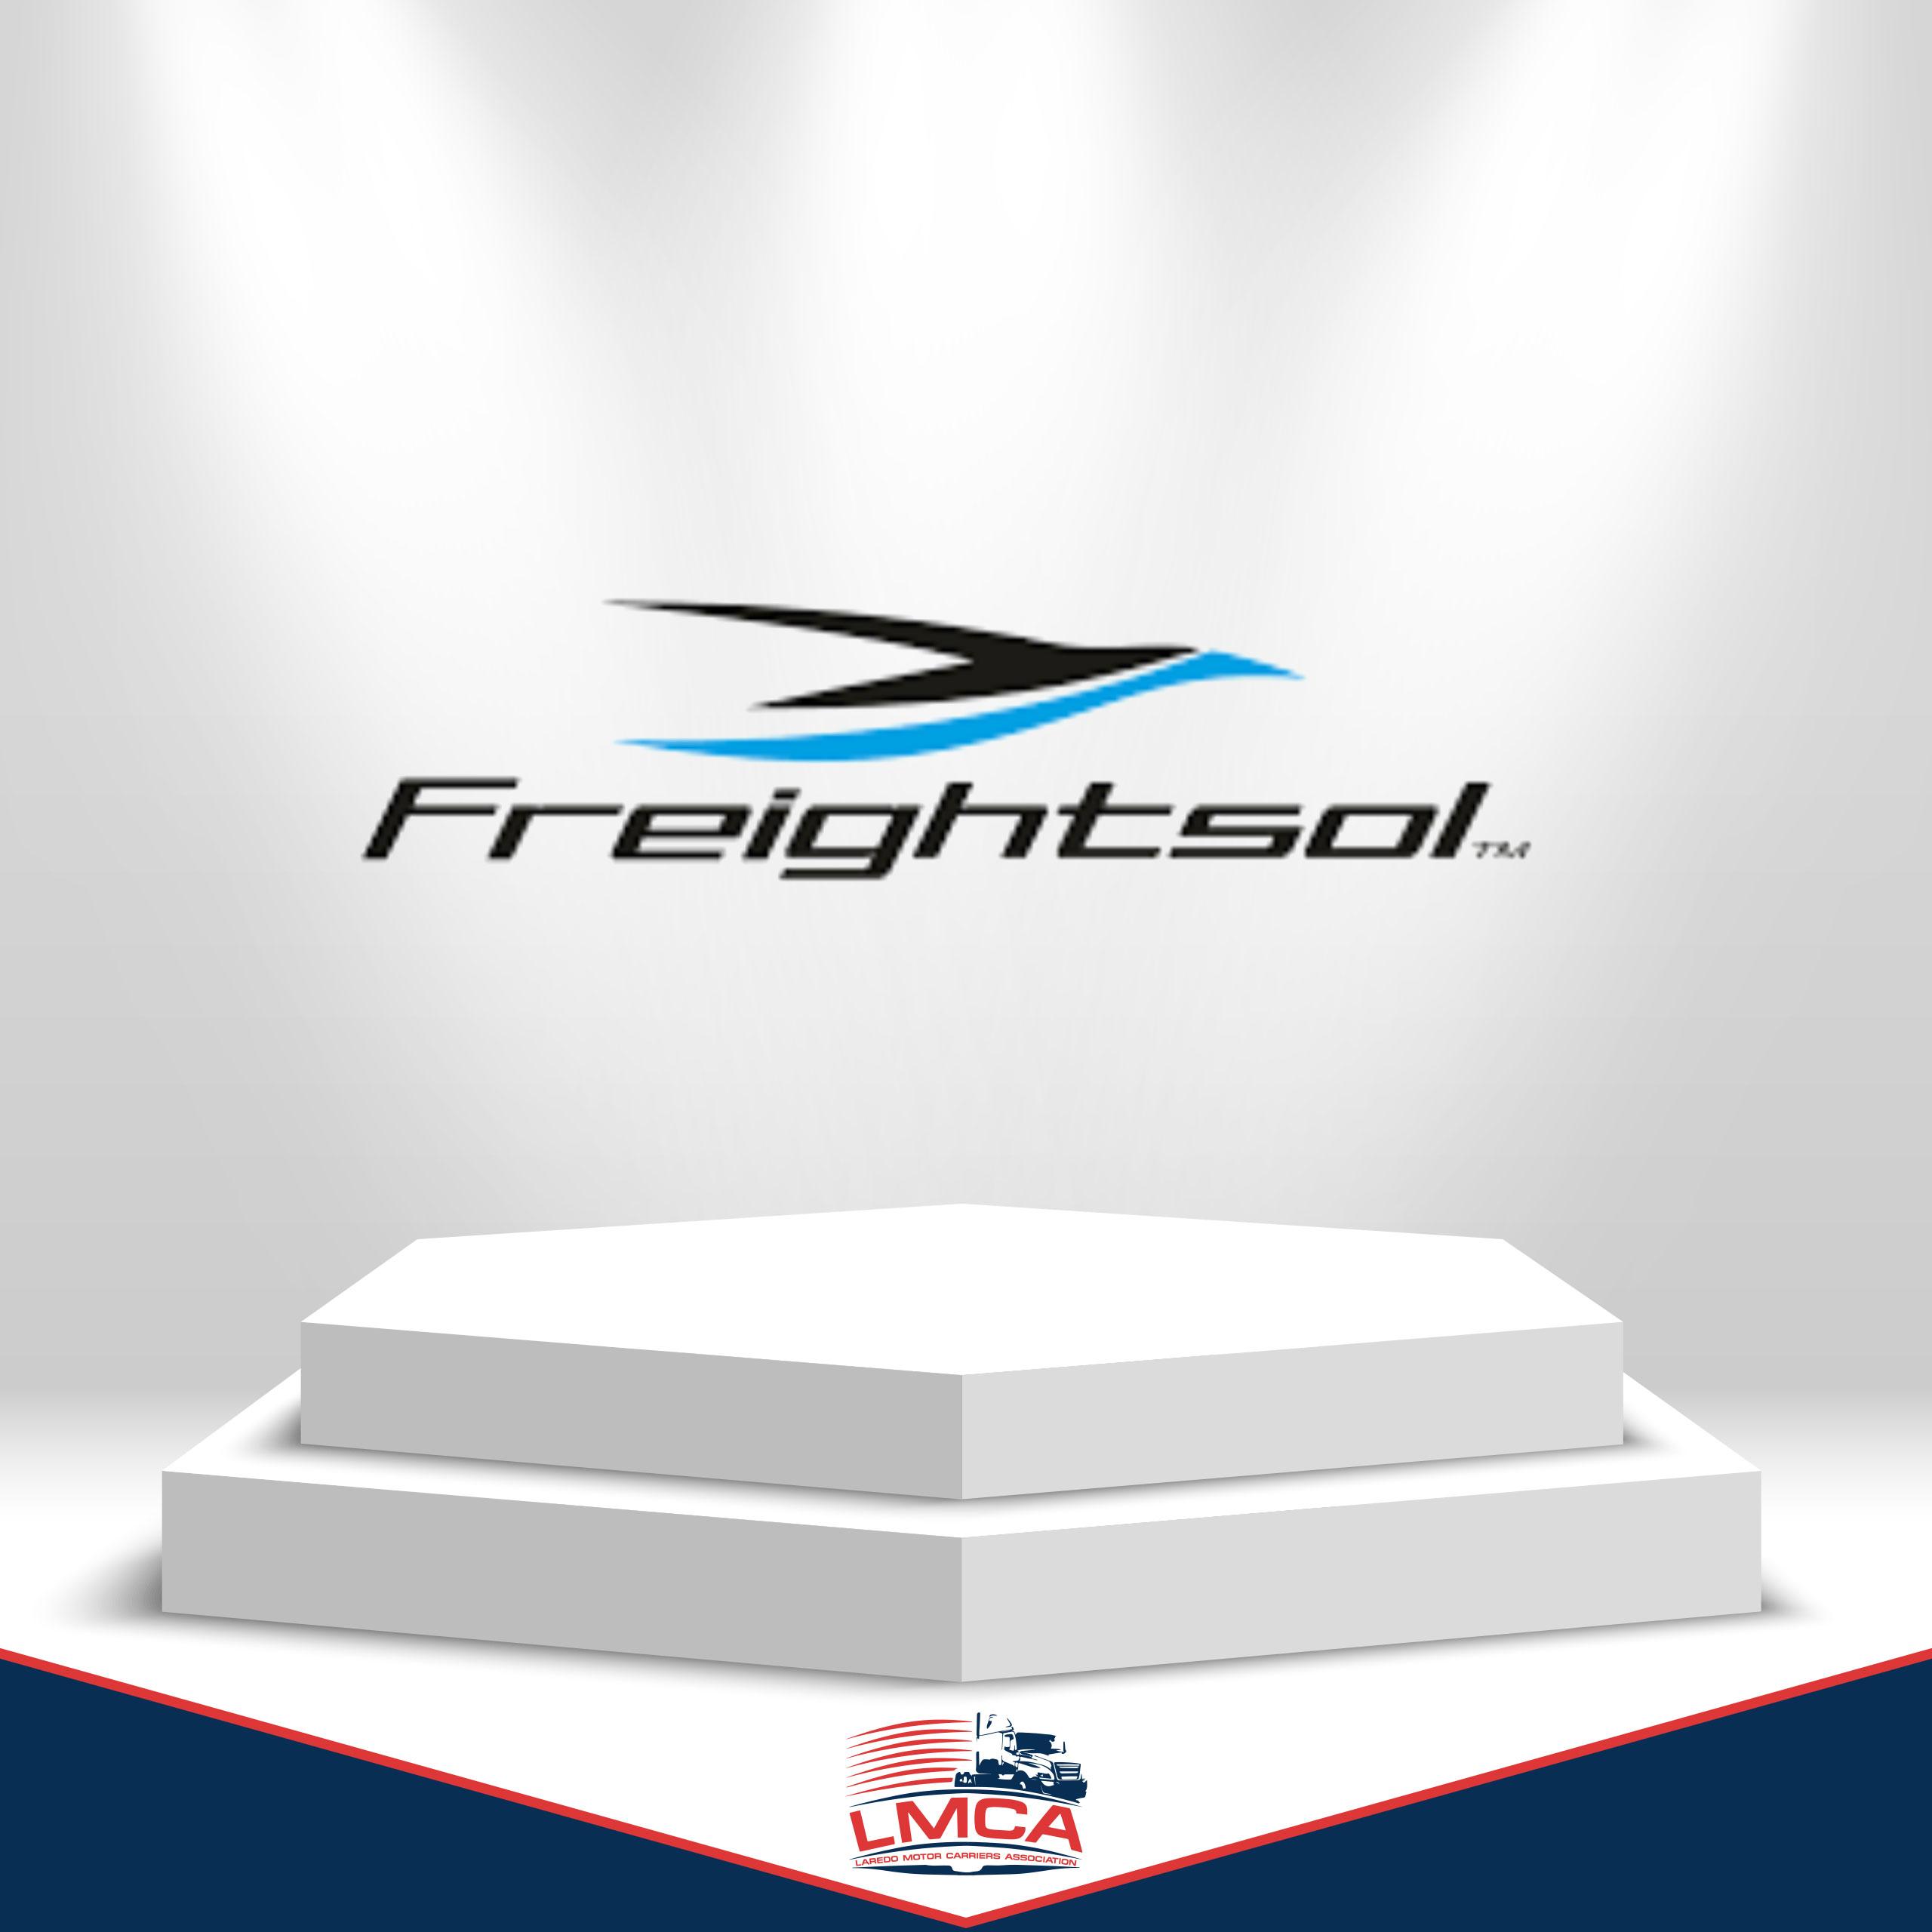 freightsol-lmca